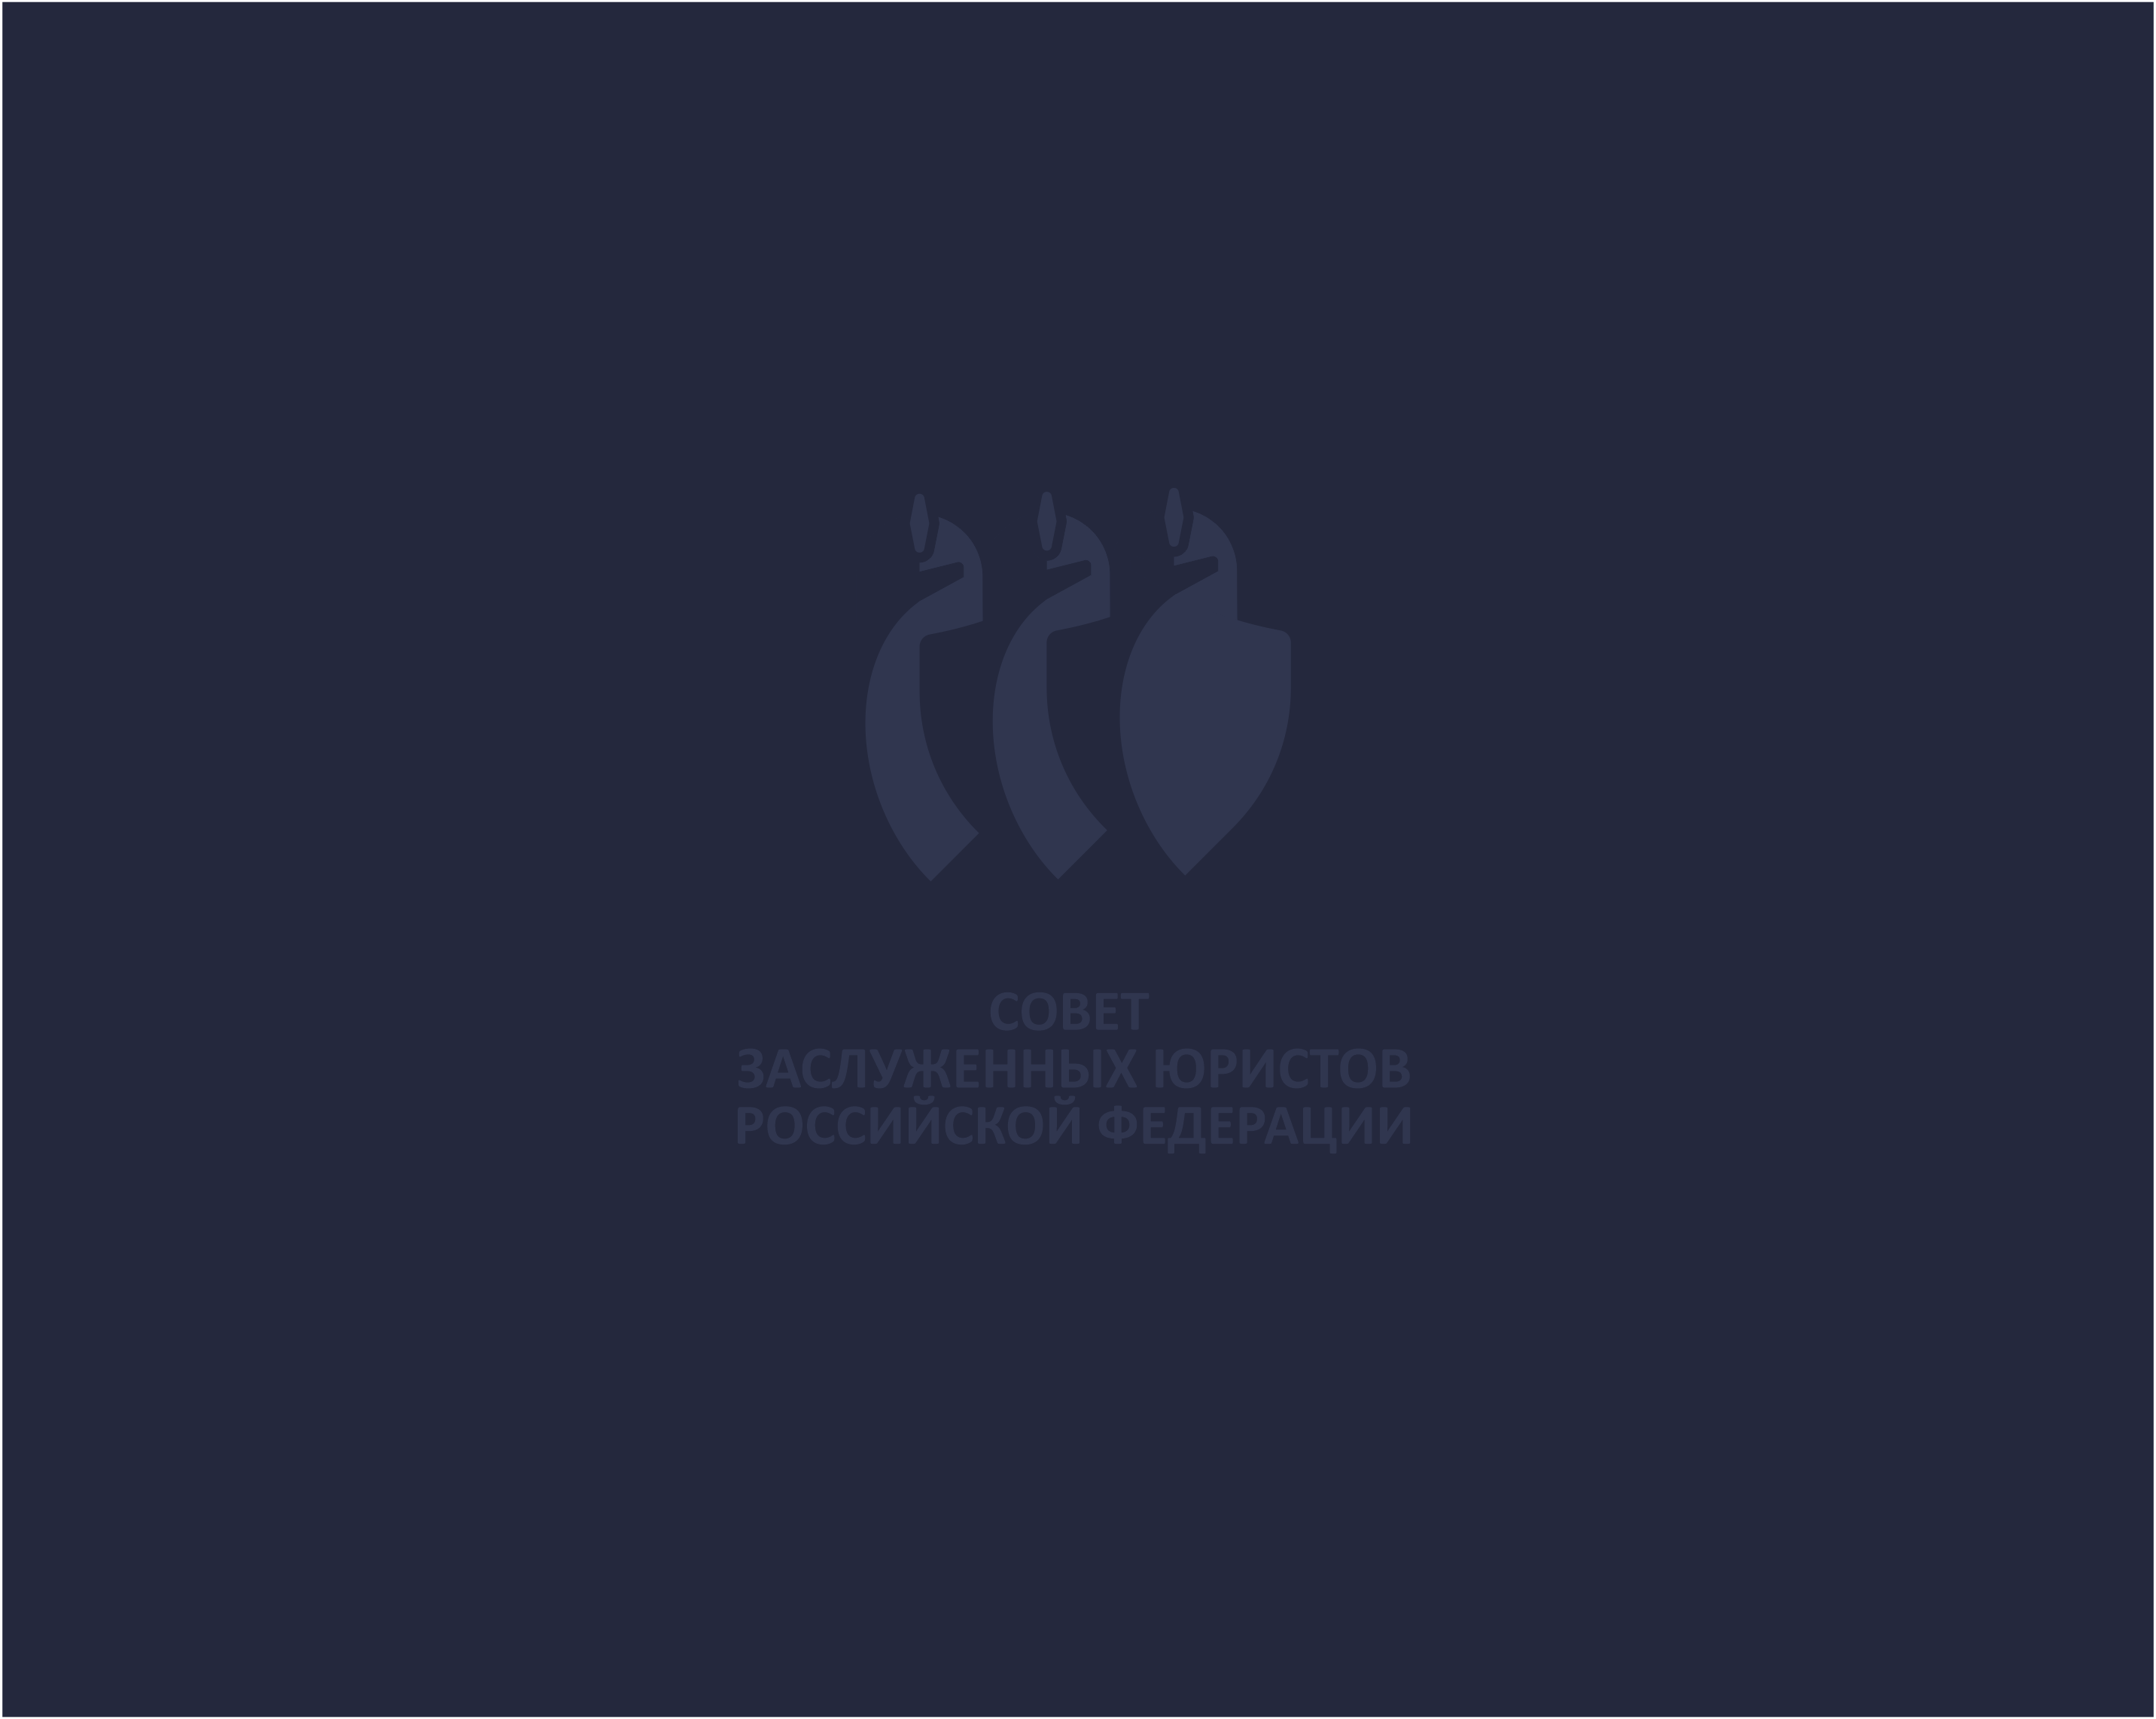 Разработка логотипа Совета (Клуба) заслуженных юристов Российской Федерации фото f_6135e41138bb2559.png